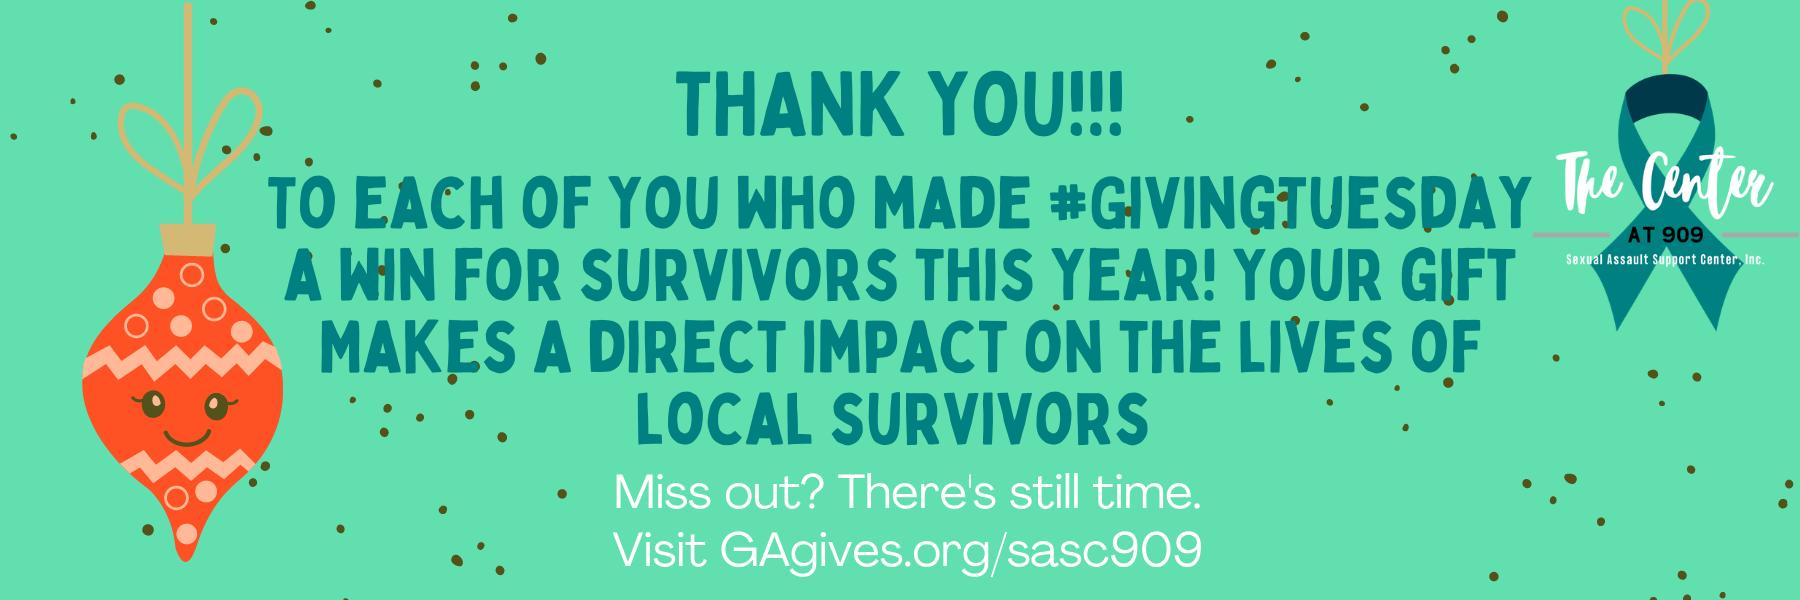 #GivingTuesday thank you (1)